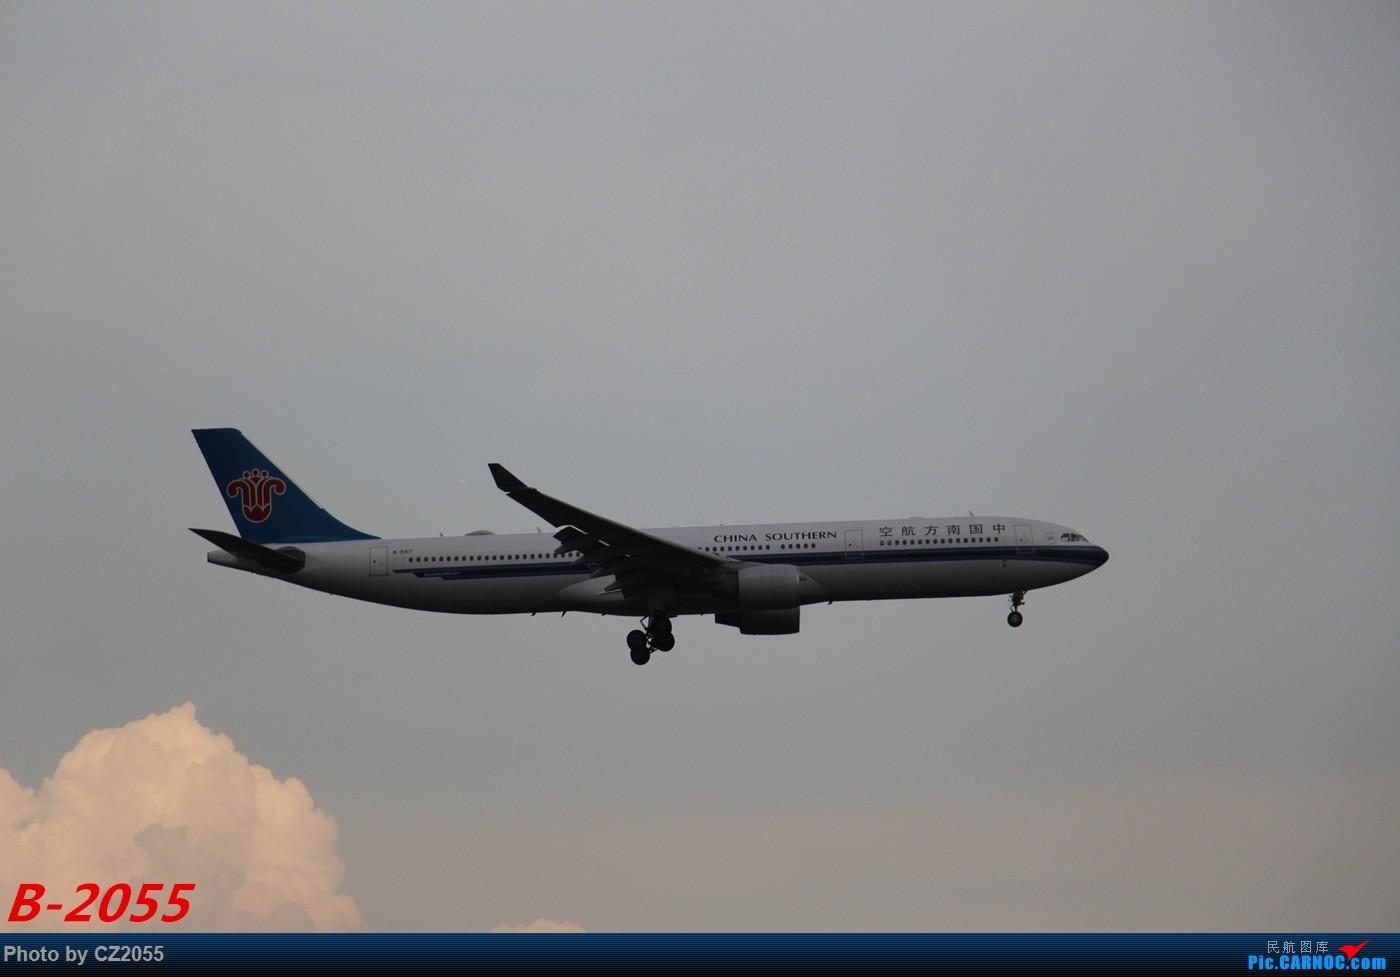 Re:[原创]【广东青少年拍机小队】【C-Z-2055】灰常灰常倒霉的一次拍机! AIRBUS A330-300 B-5917 中国广州白云国际机场